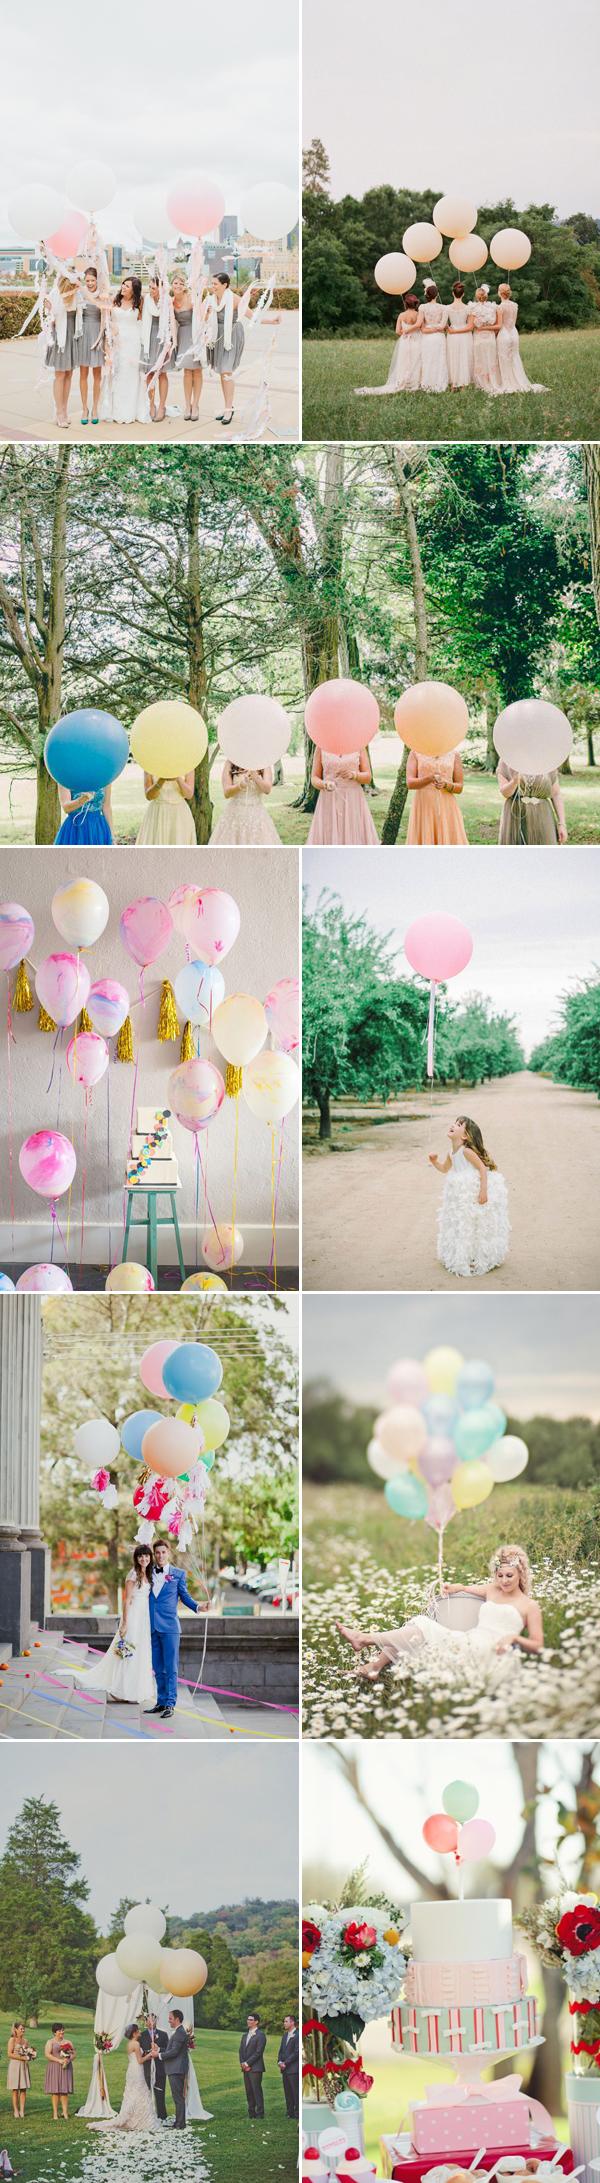 balloons01-pastel